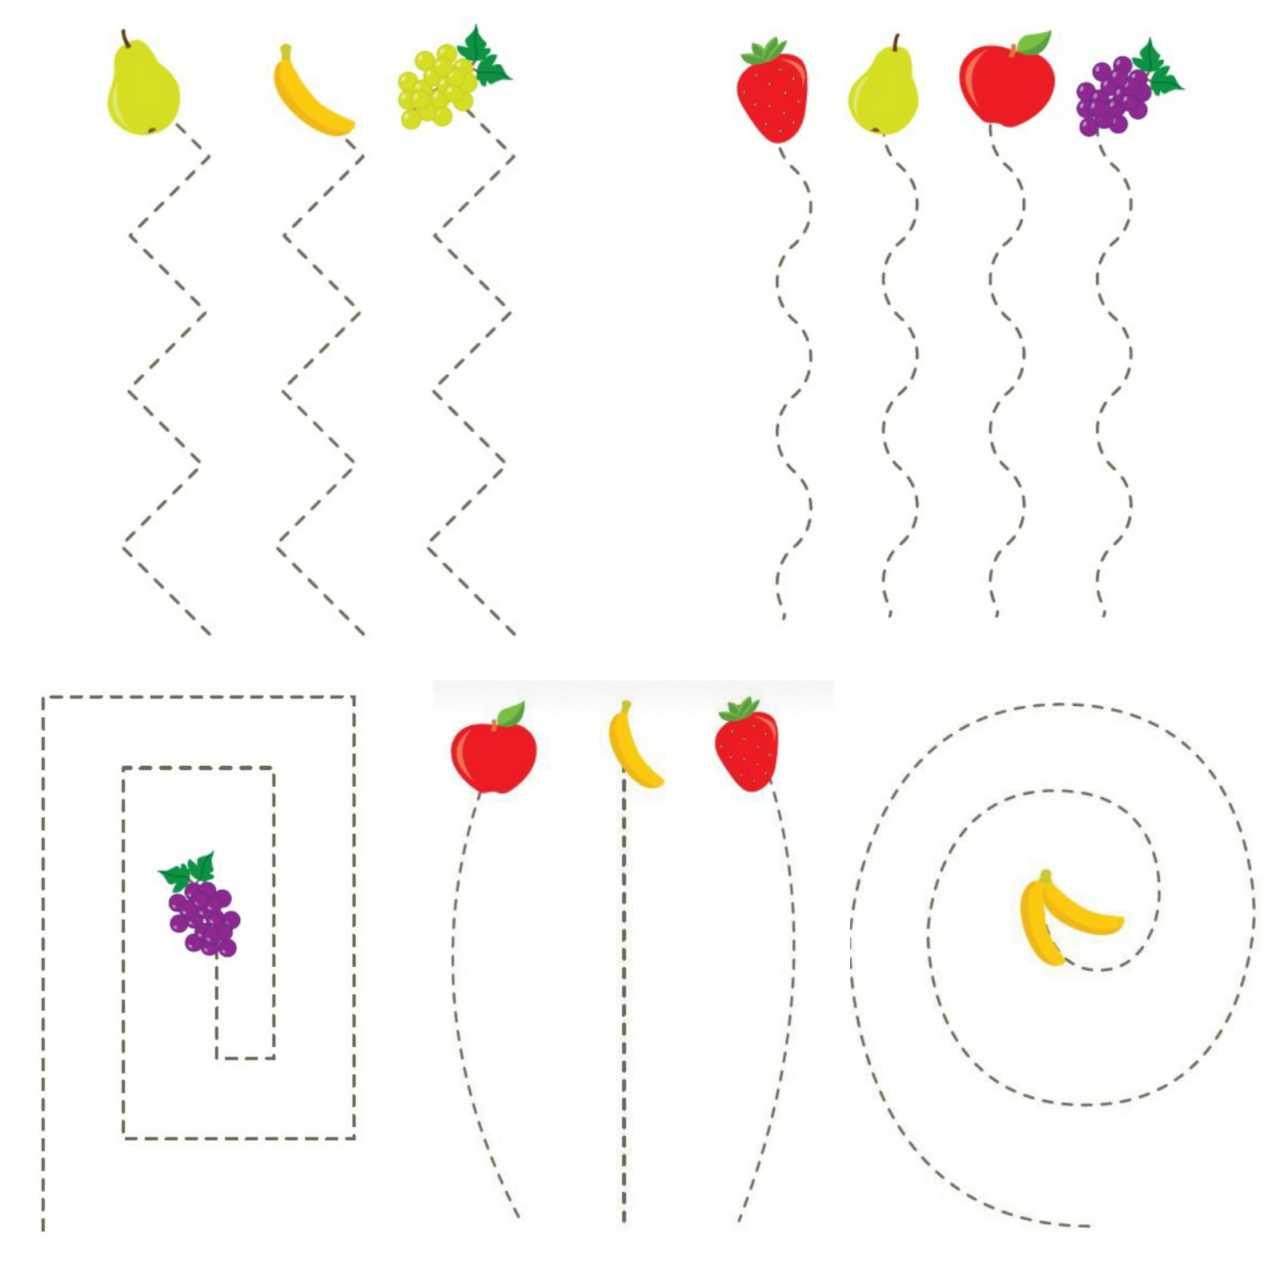 Meyveler Cizgi Calismalari 8 Sayfa A4 Renkli Cikti Makas Calismalari